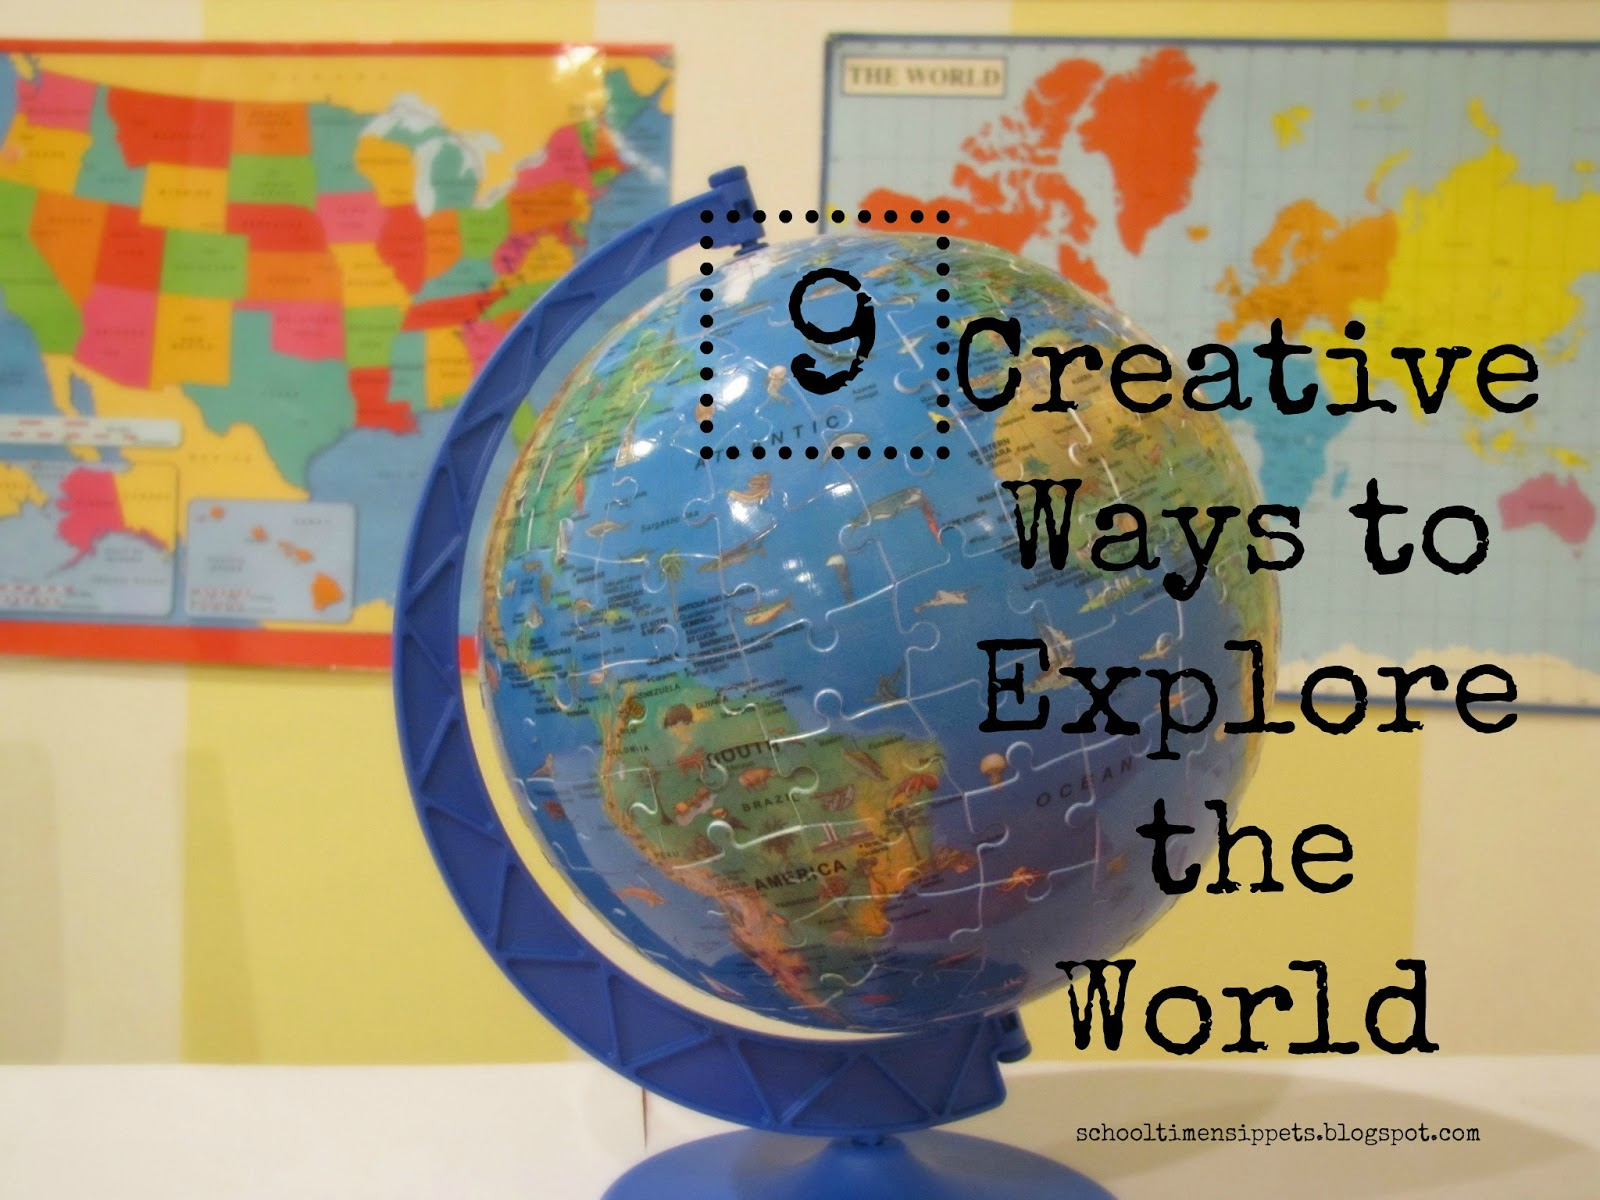 9 Creative Ways To Explore The World